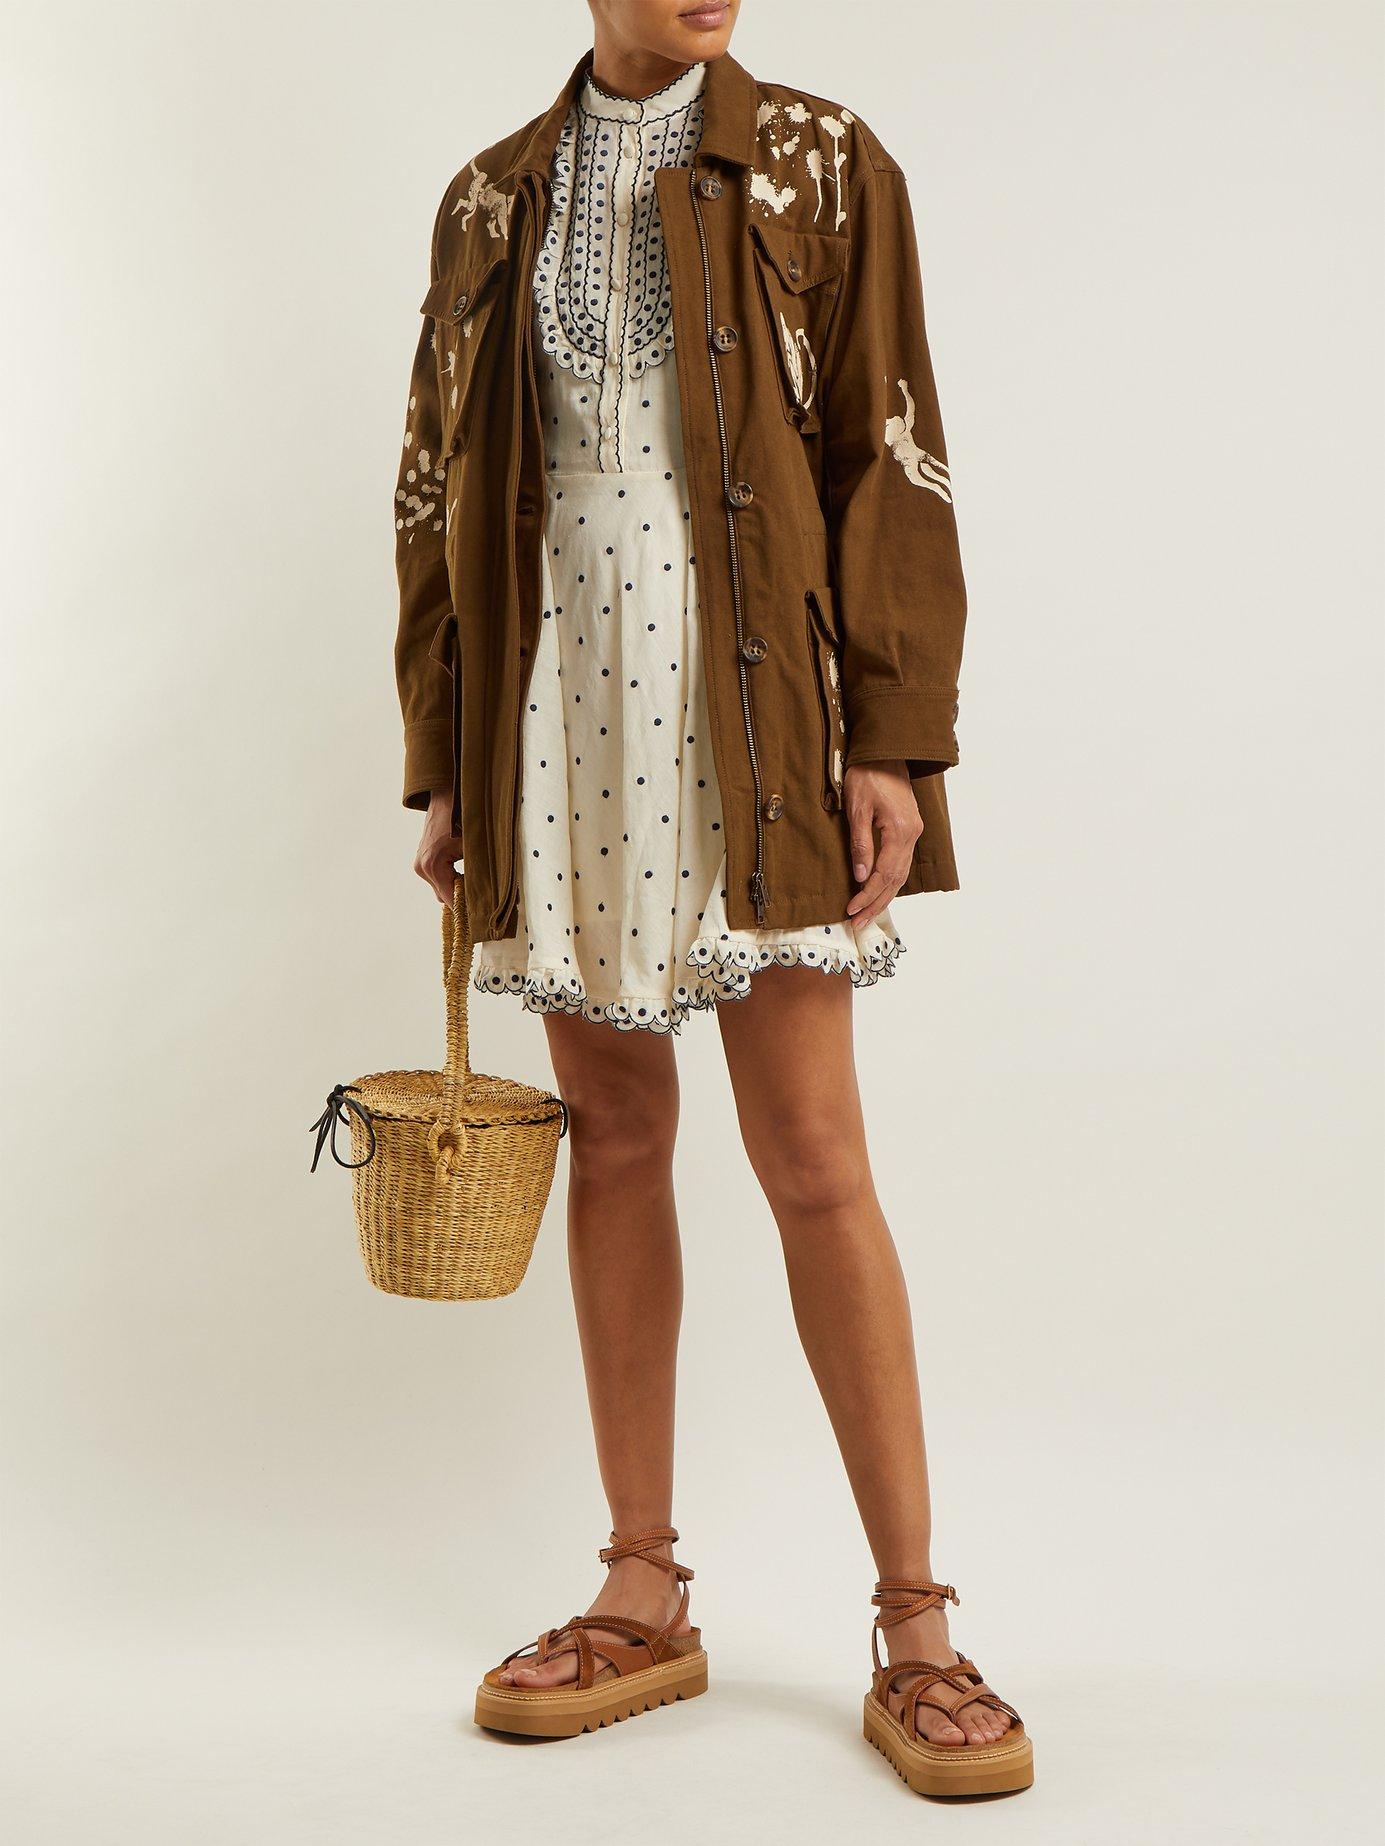 Polka-dot scallop-edged cotton dress by Redvalentino